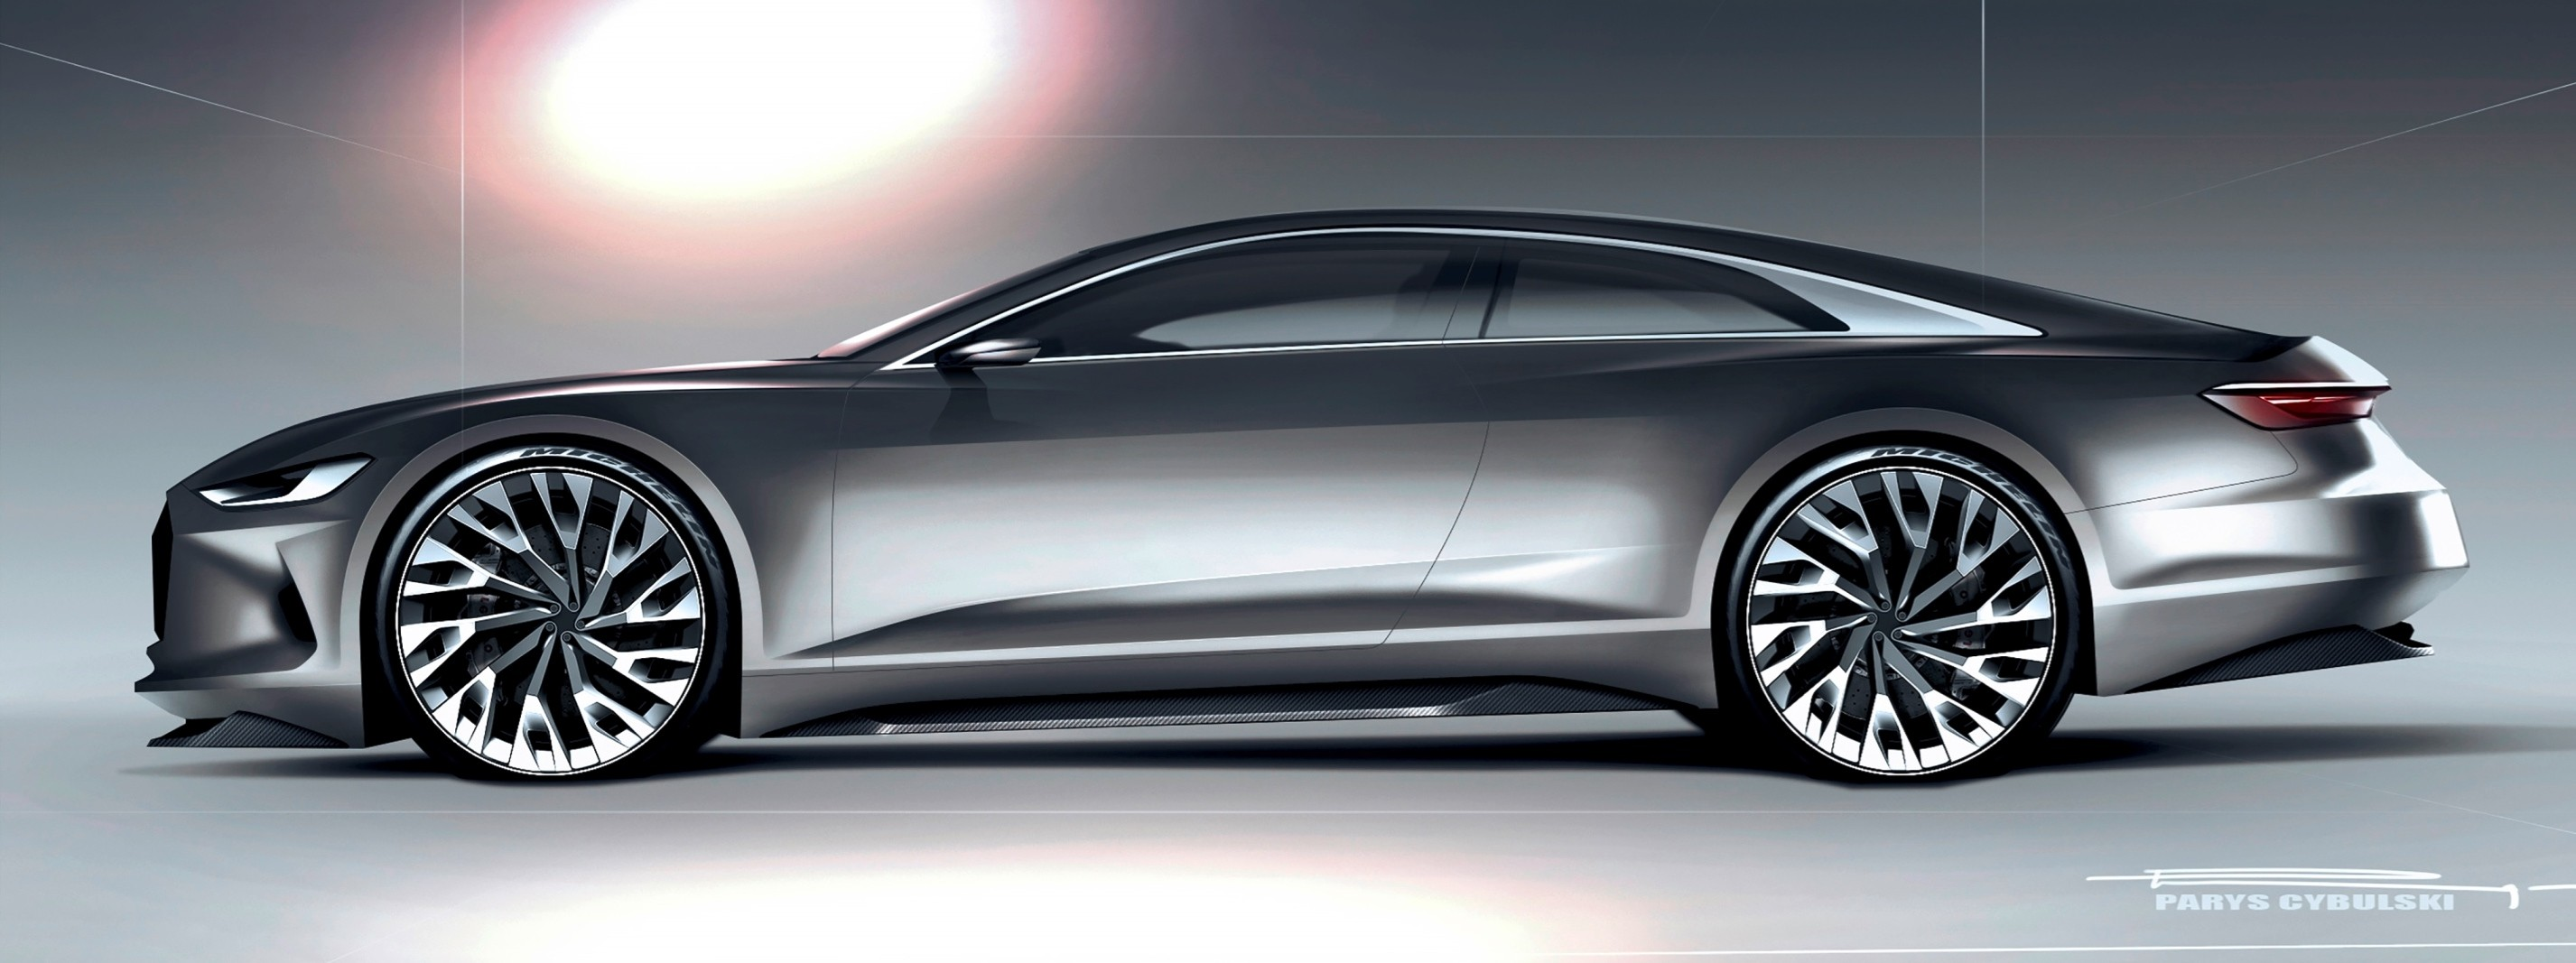 2014 Audi Prologue is Worst of LA 2014 2